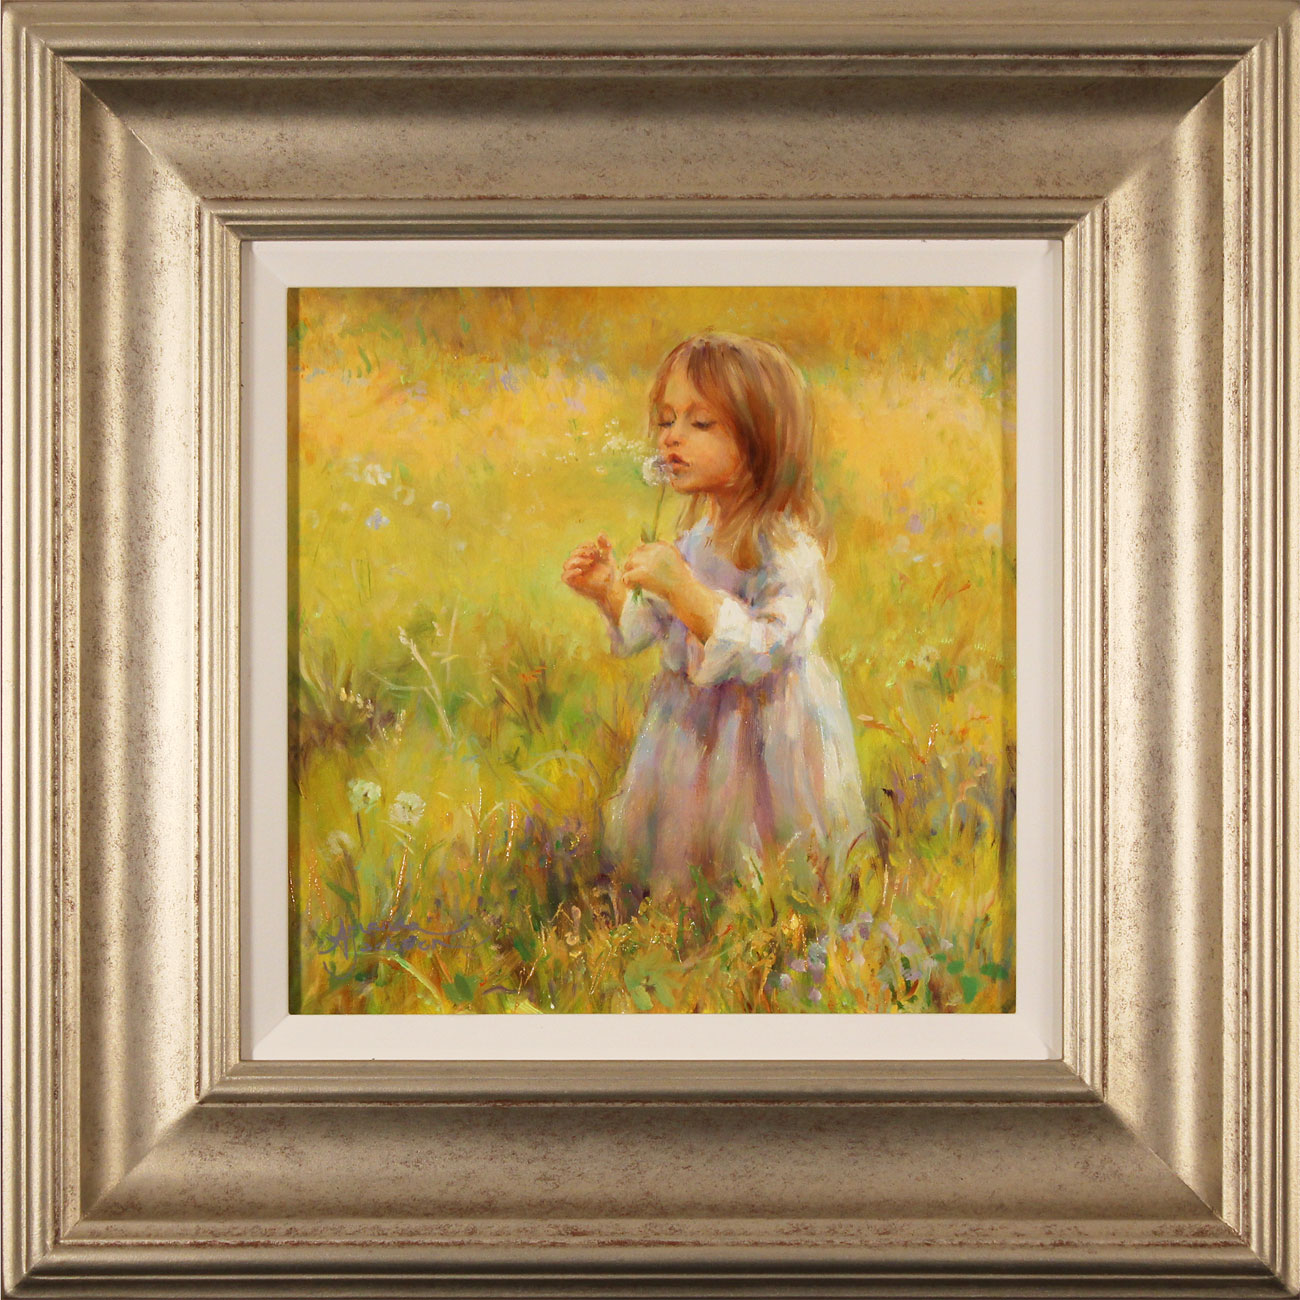 Amanda Jackson, Original oil painting on panel, Golden Memories. Click to enlarge